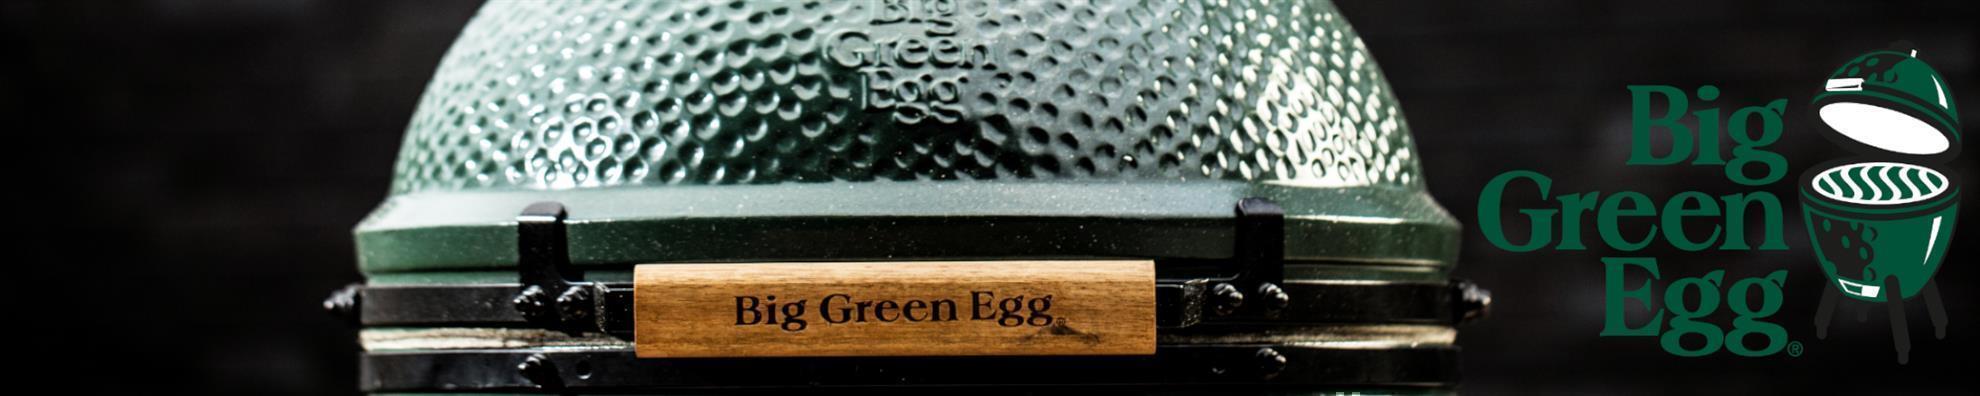 Big Green Egg - Pizza Schaufel aus Aluminium